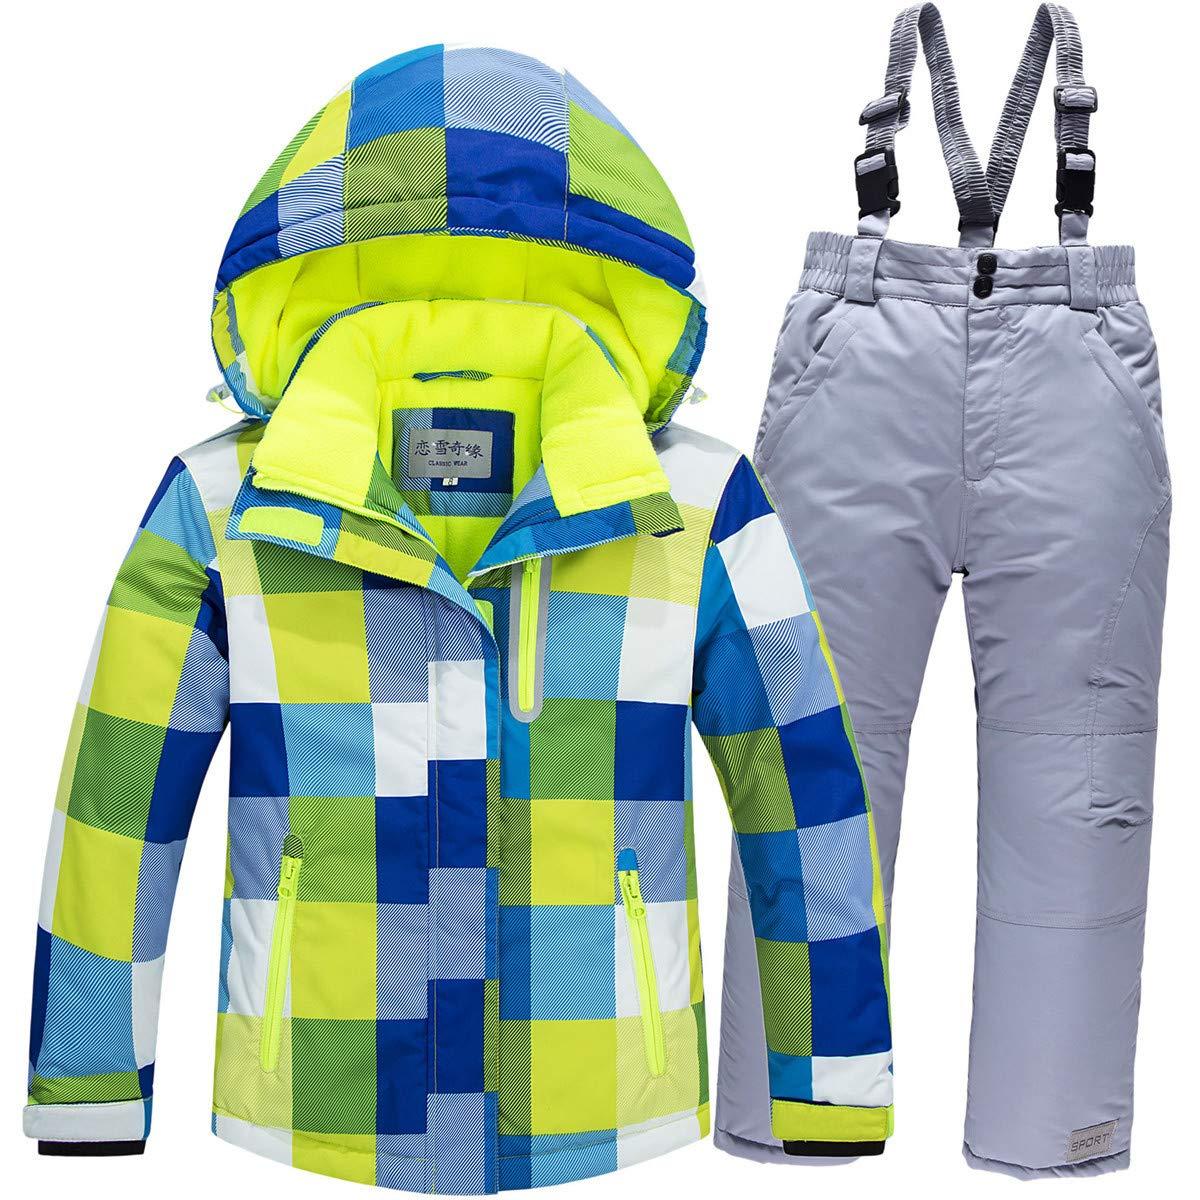 Baby Girls Boys Kids Winter Warm Outdoor Mountain Waterproof Windproof Snowboarding Skiing Jackets with Snow Ski Bib Pants US16 by JELEUON